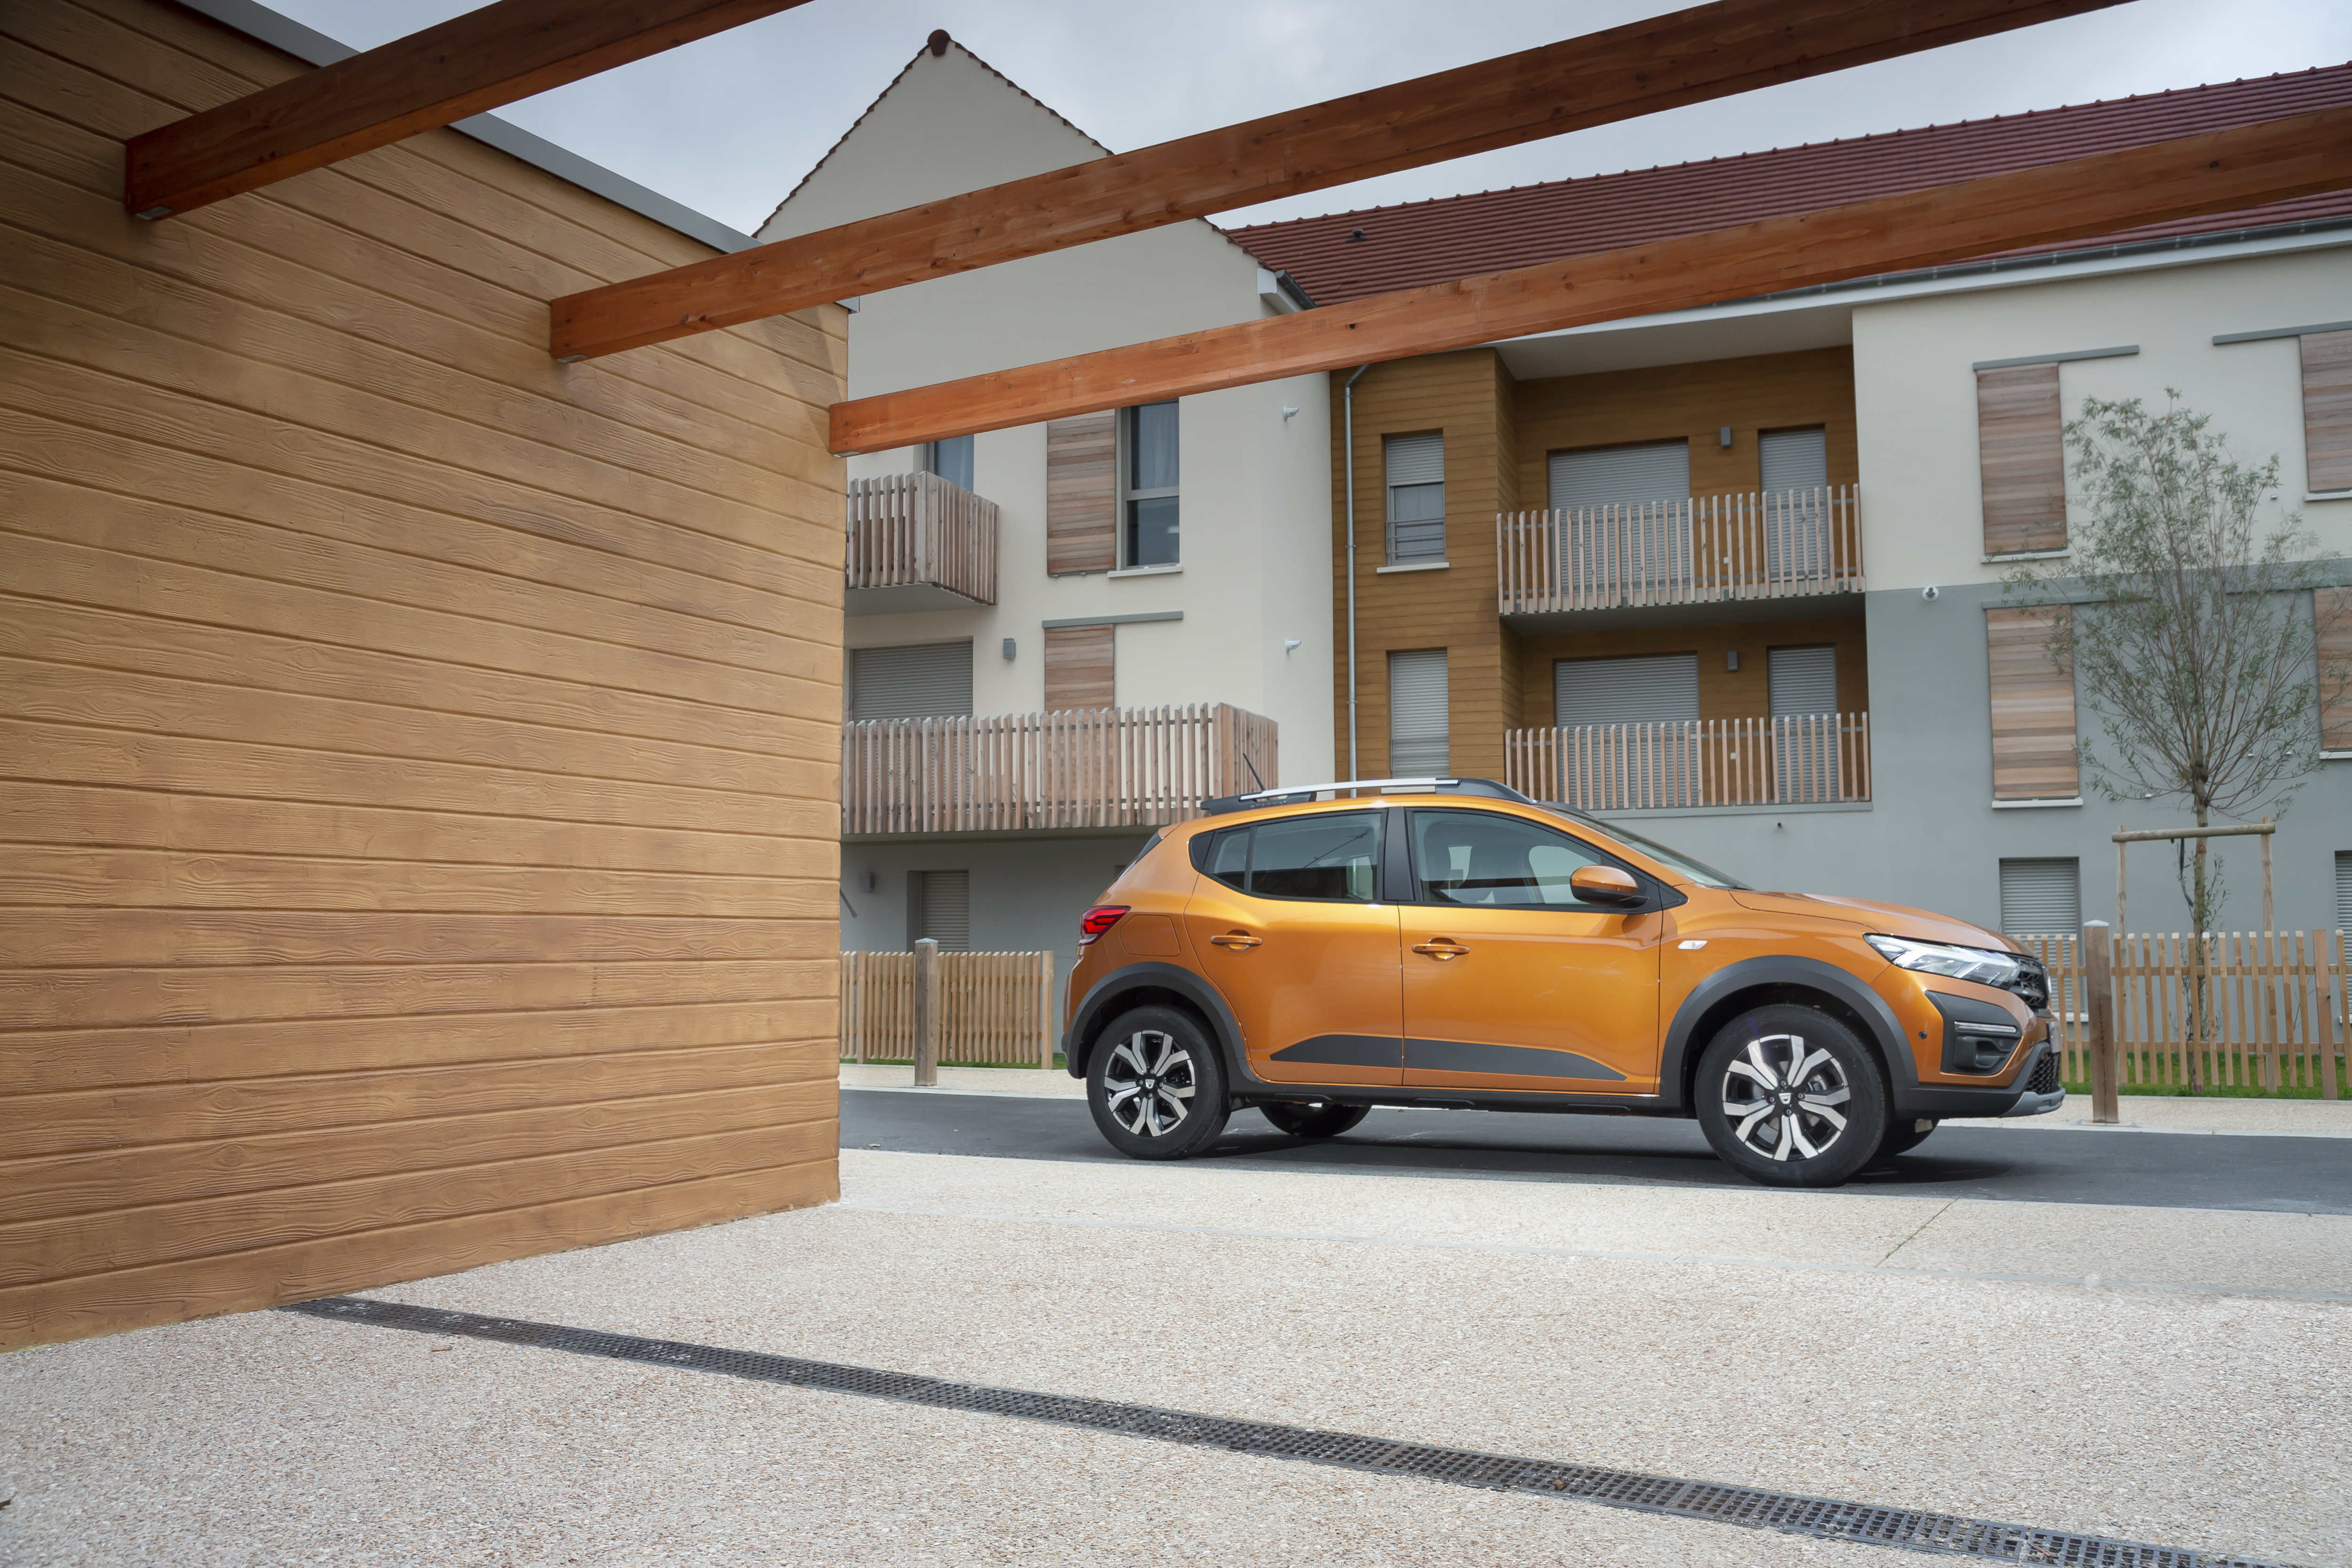 2020 - Essais presse Nouvelle Dacia SANDERO STEPWAY (5)